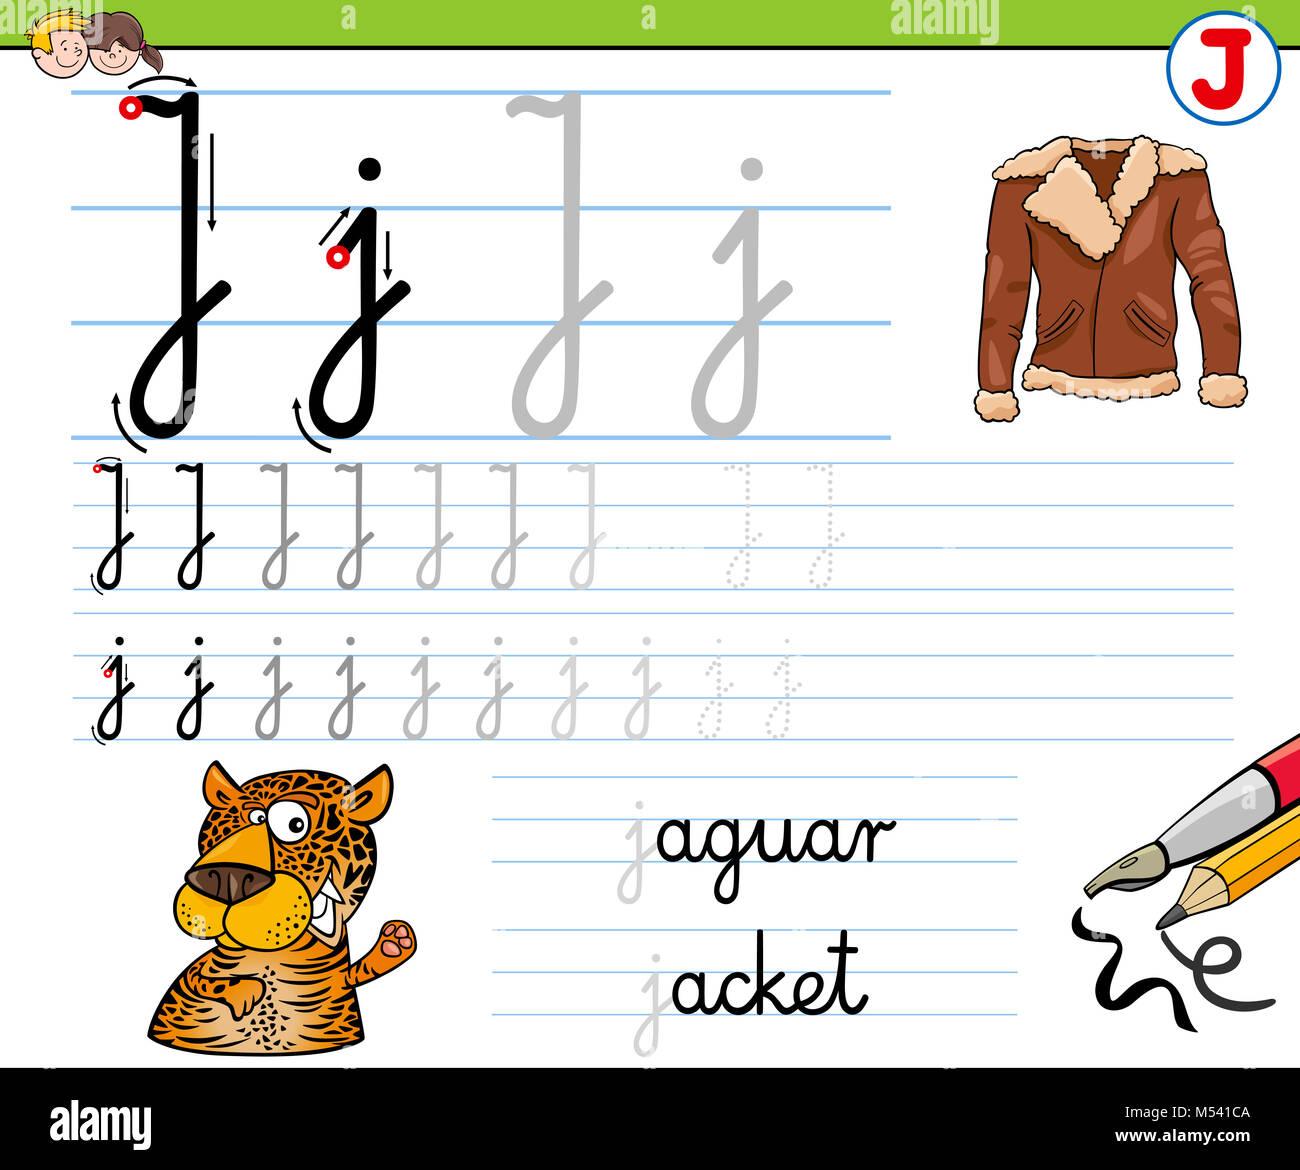 Nett Alphabet Kursiv Arbeitsblatt Bilder - Super Lehrer ...